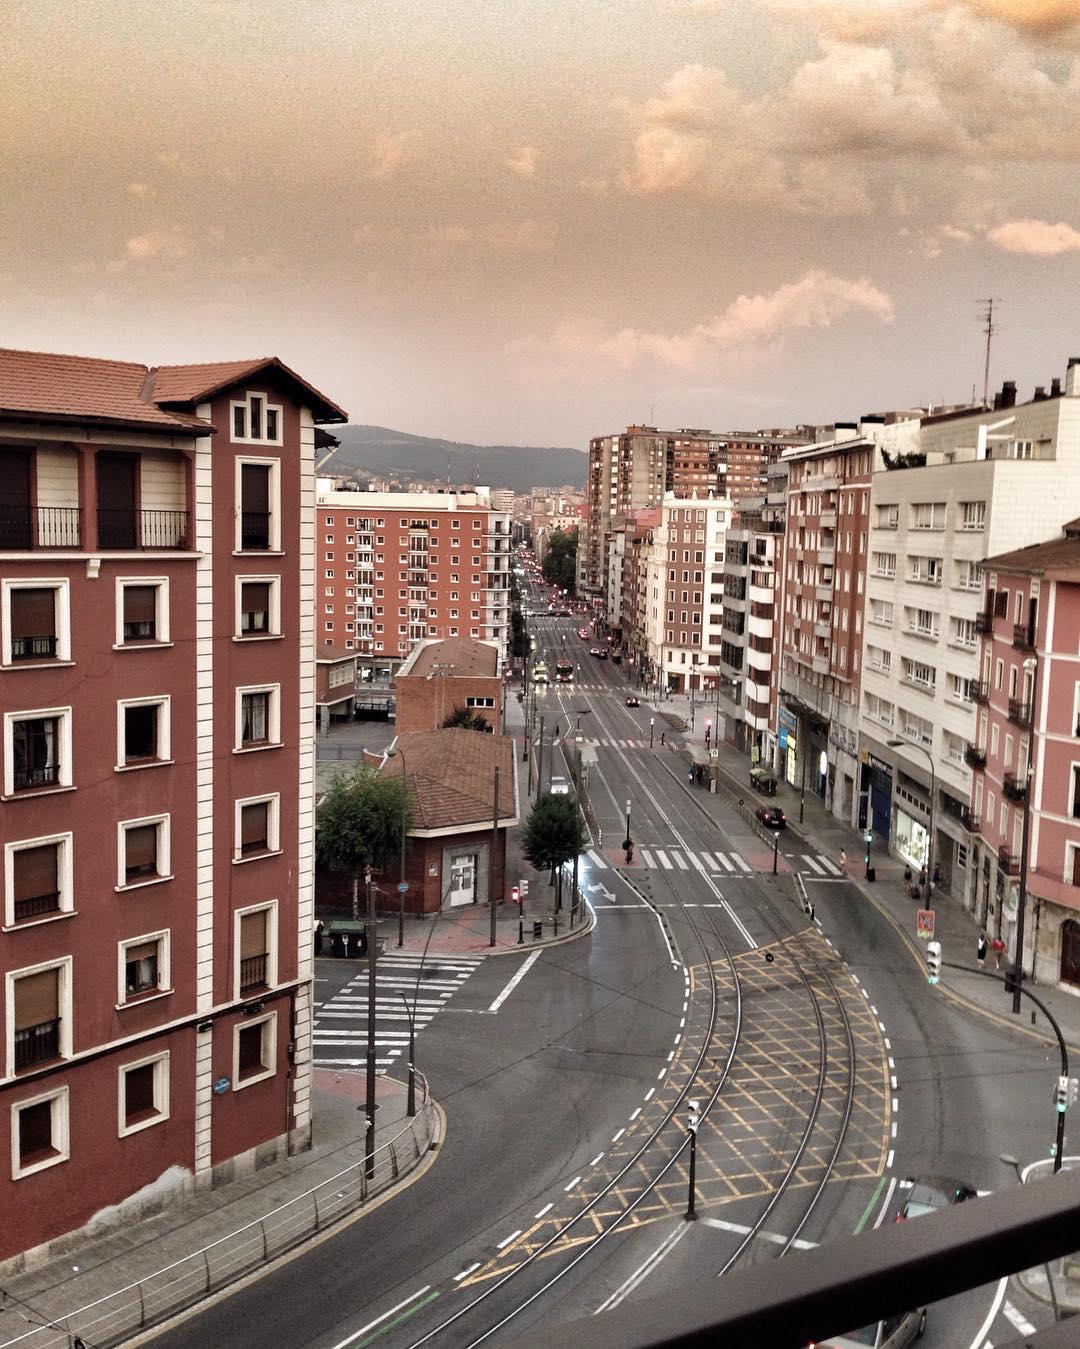 Bilbao como has cambiado - Bilbao Como Has Cambiado